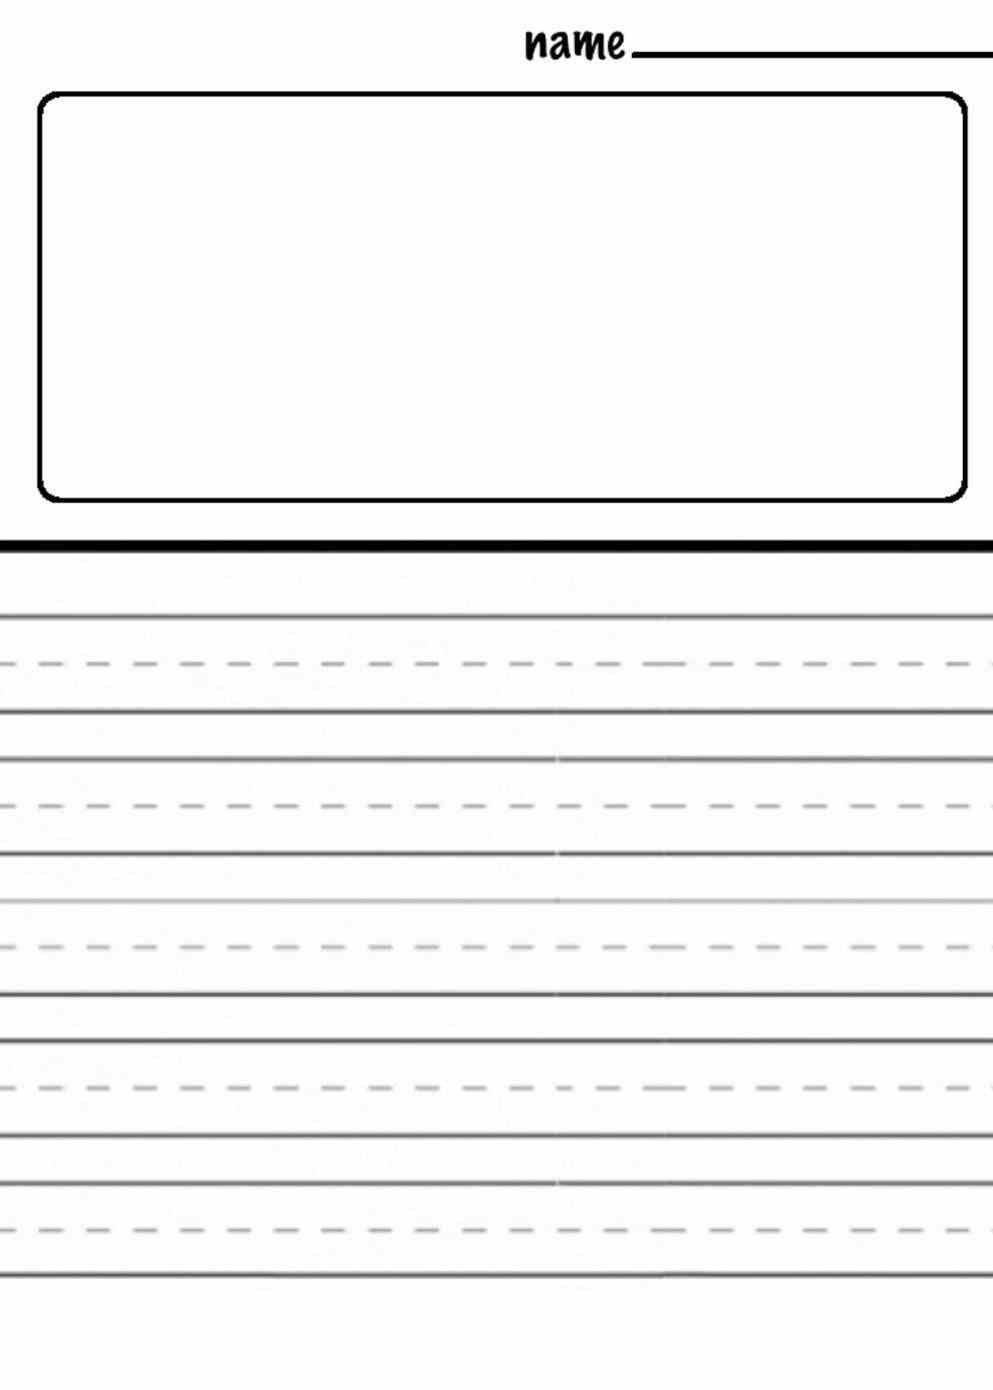 Image Result For Free Printable Handwriting Paper  Language